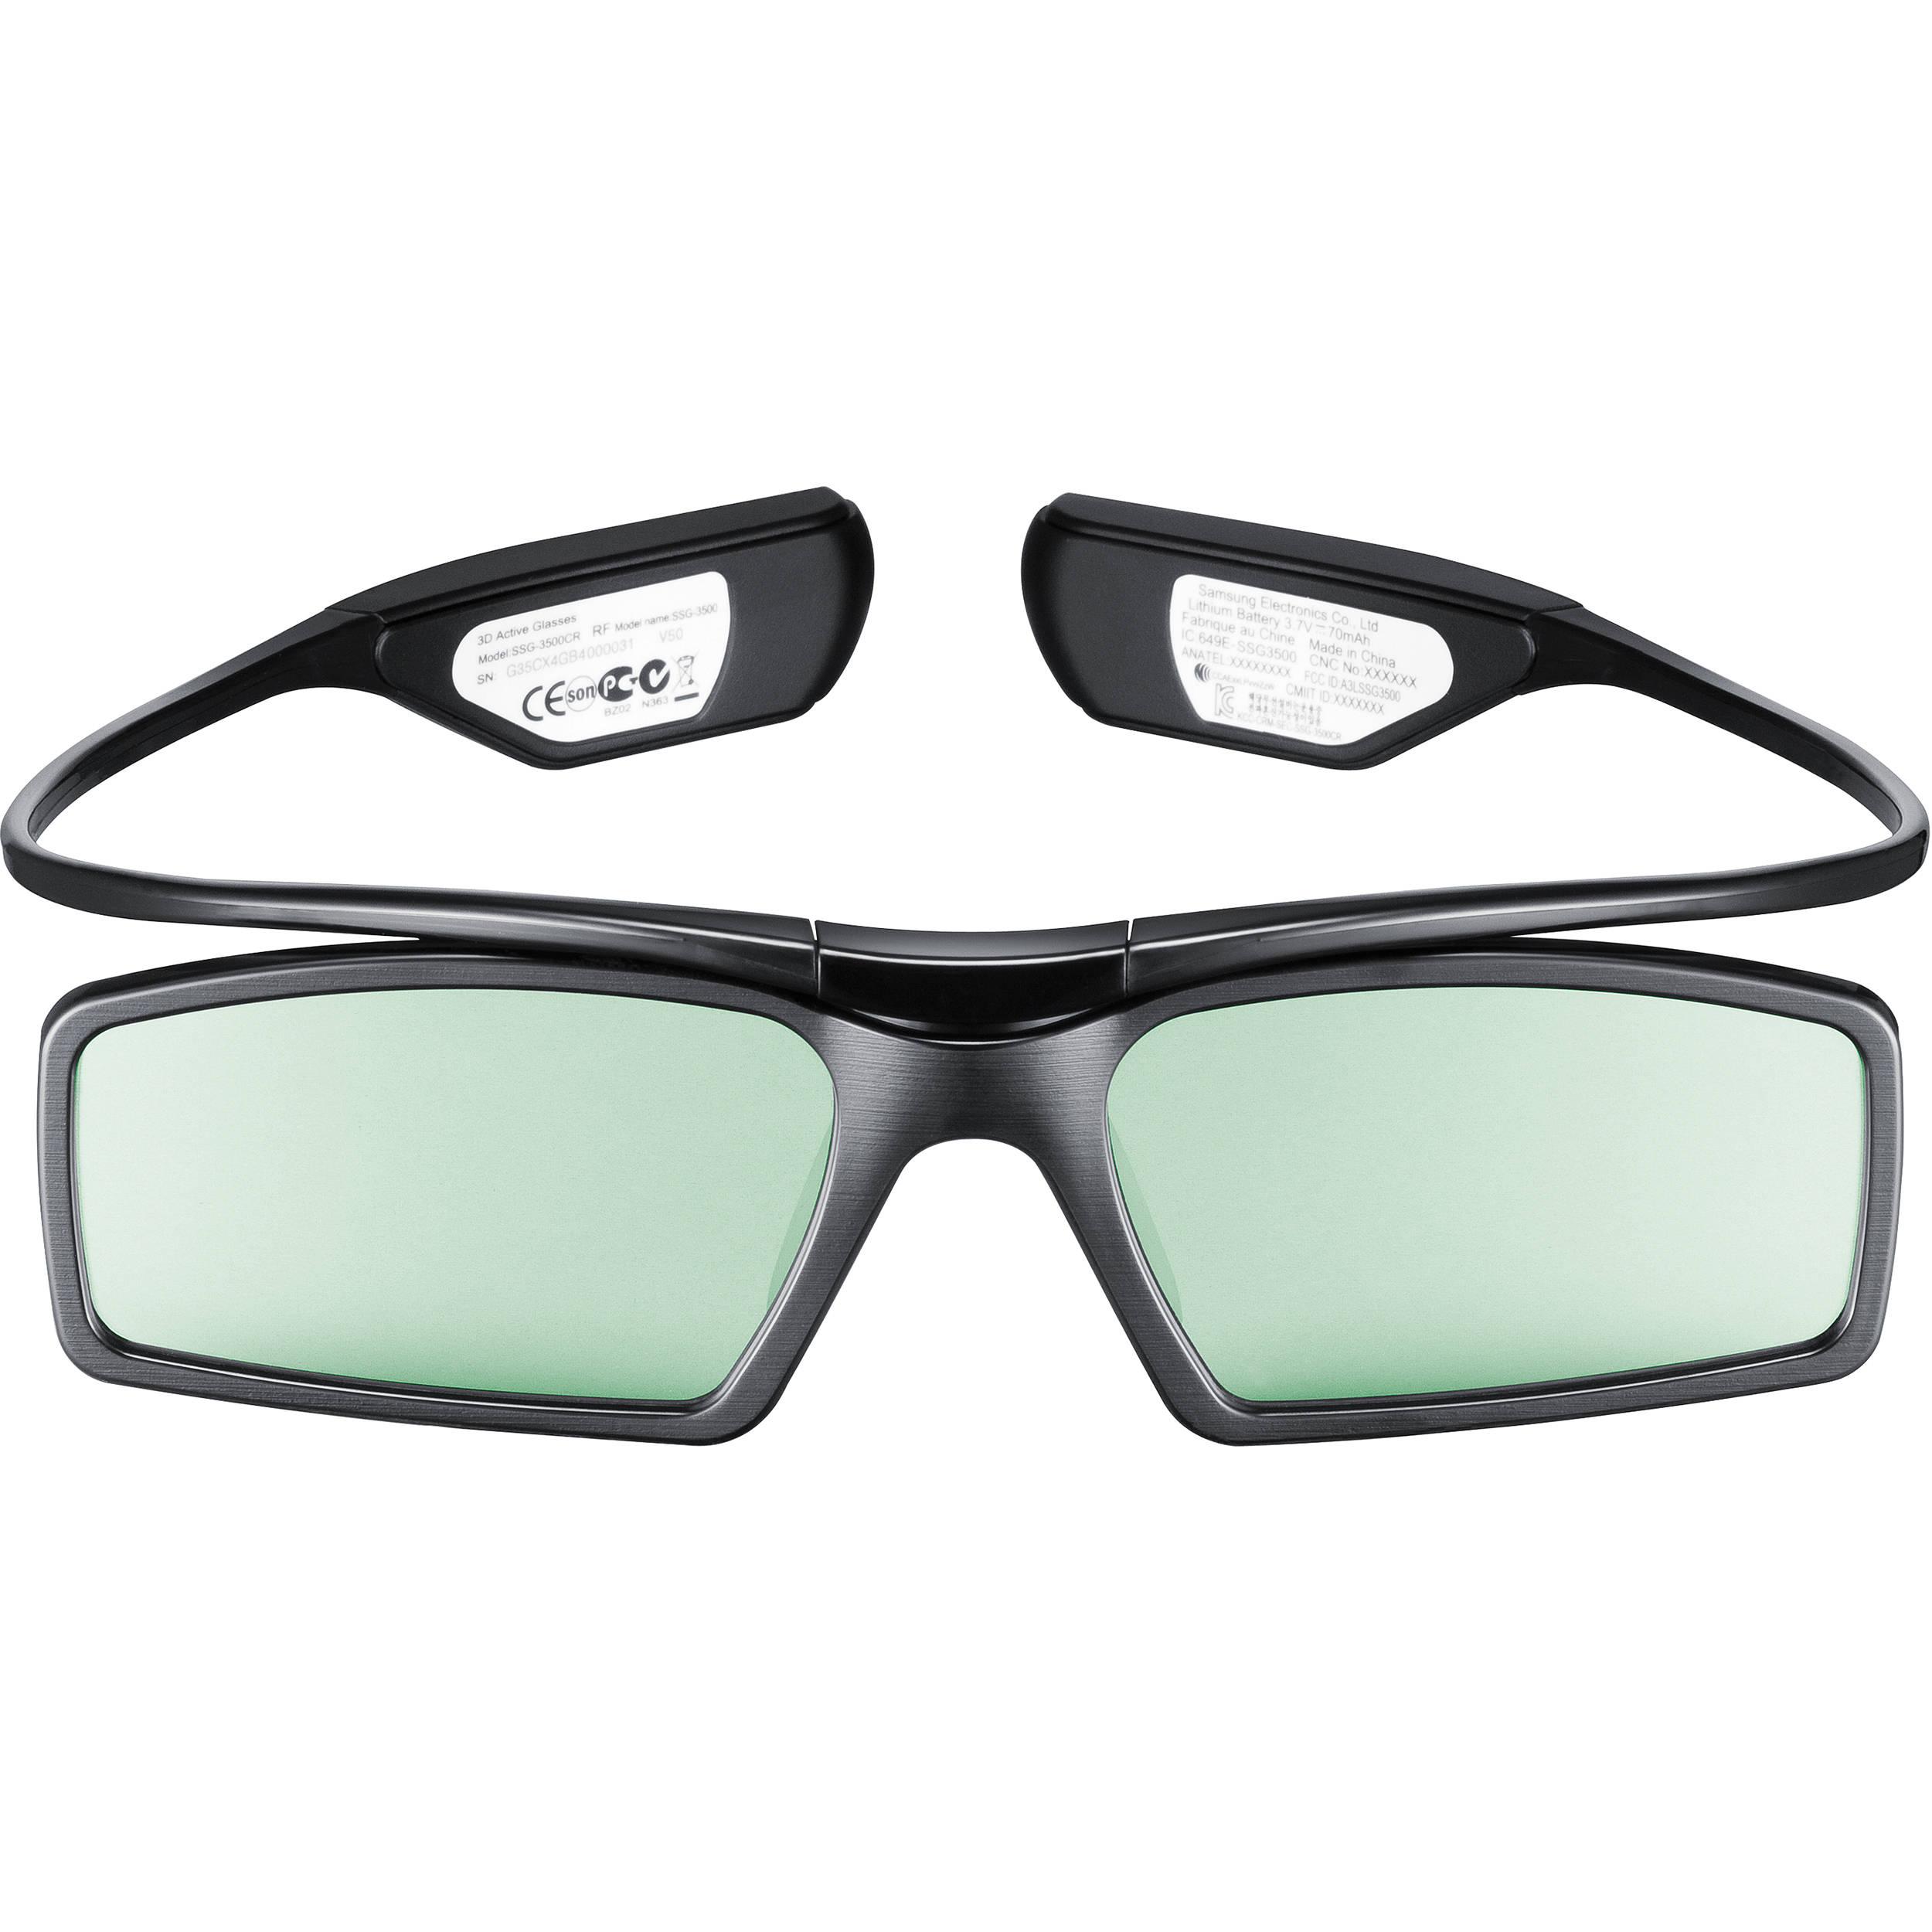 cfc6c410e09d Samsung SSG-3570CR/ZA 3D Rechargeable Glasses SSG-3570CR/ZA B&H